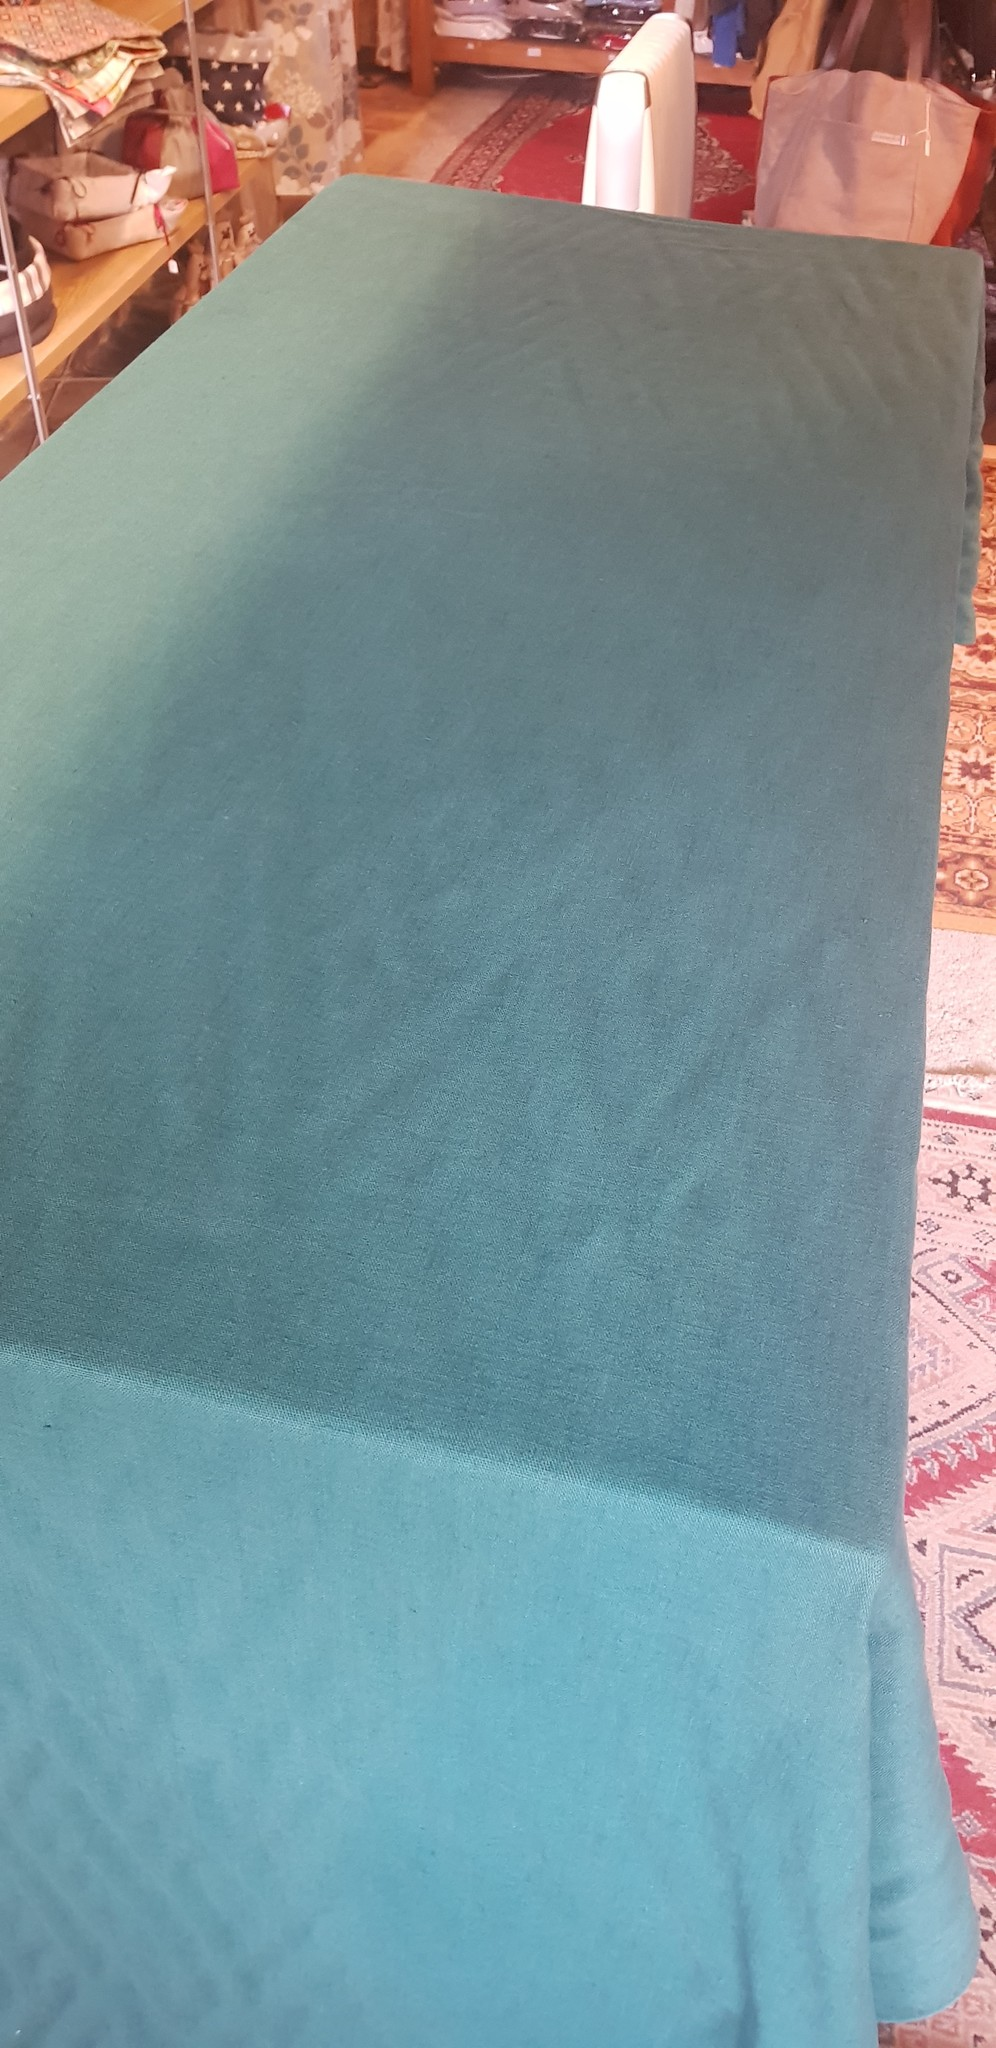 Le grenier du lin Washed linen tablecloth fir green